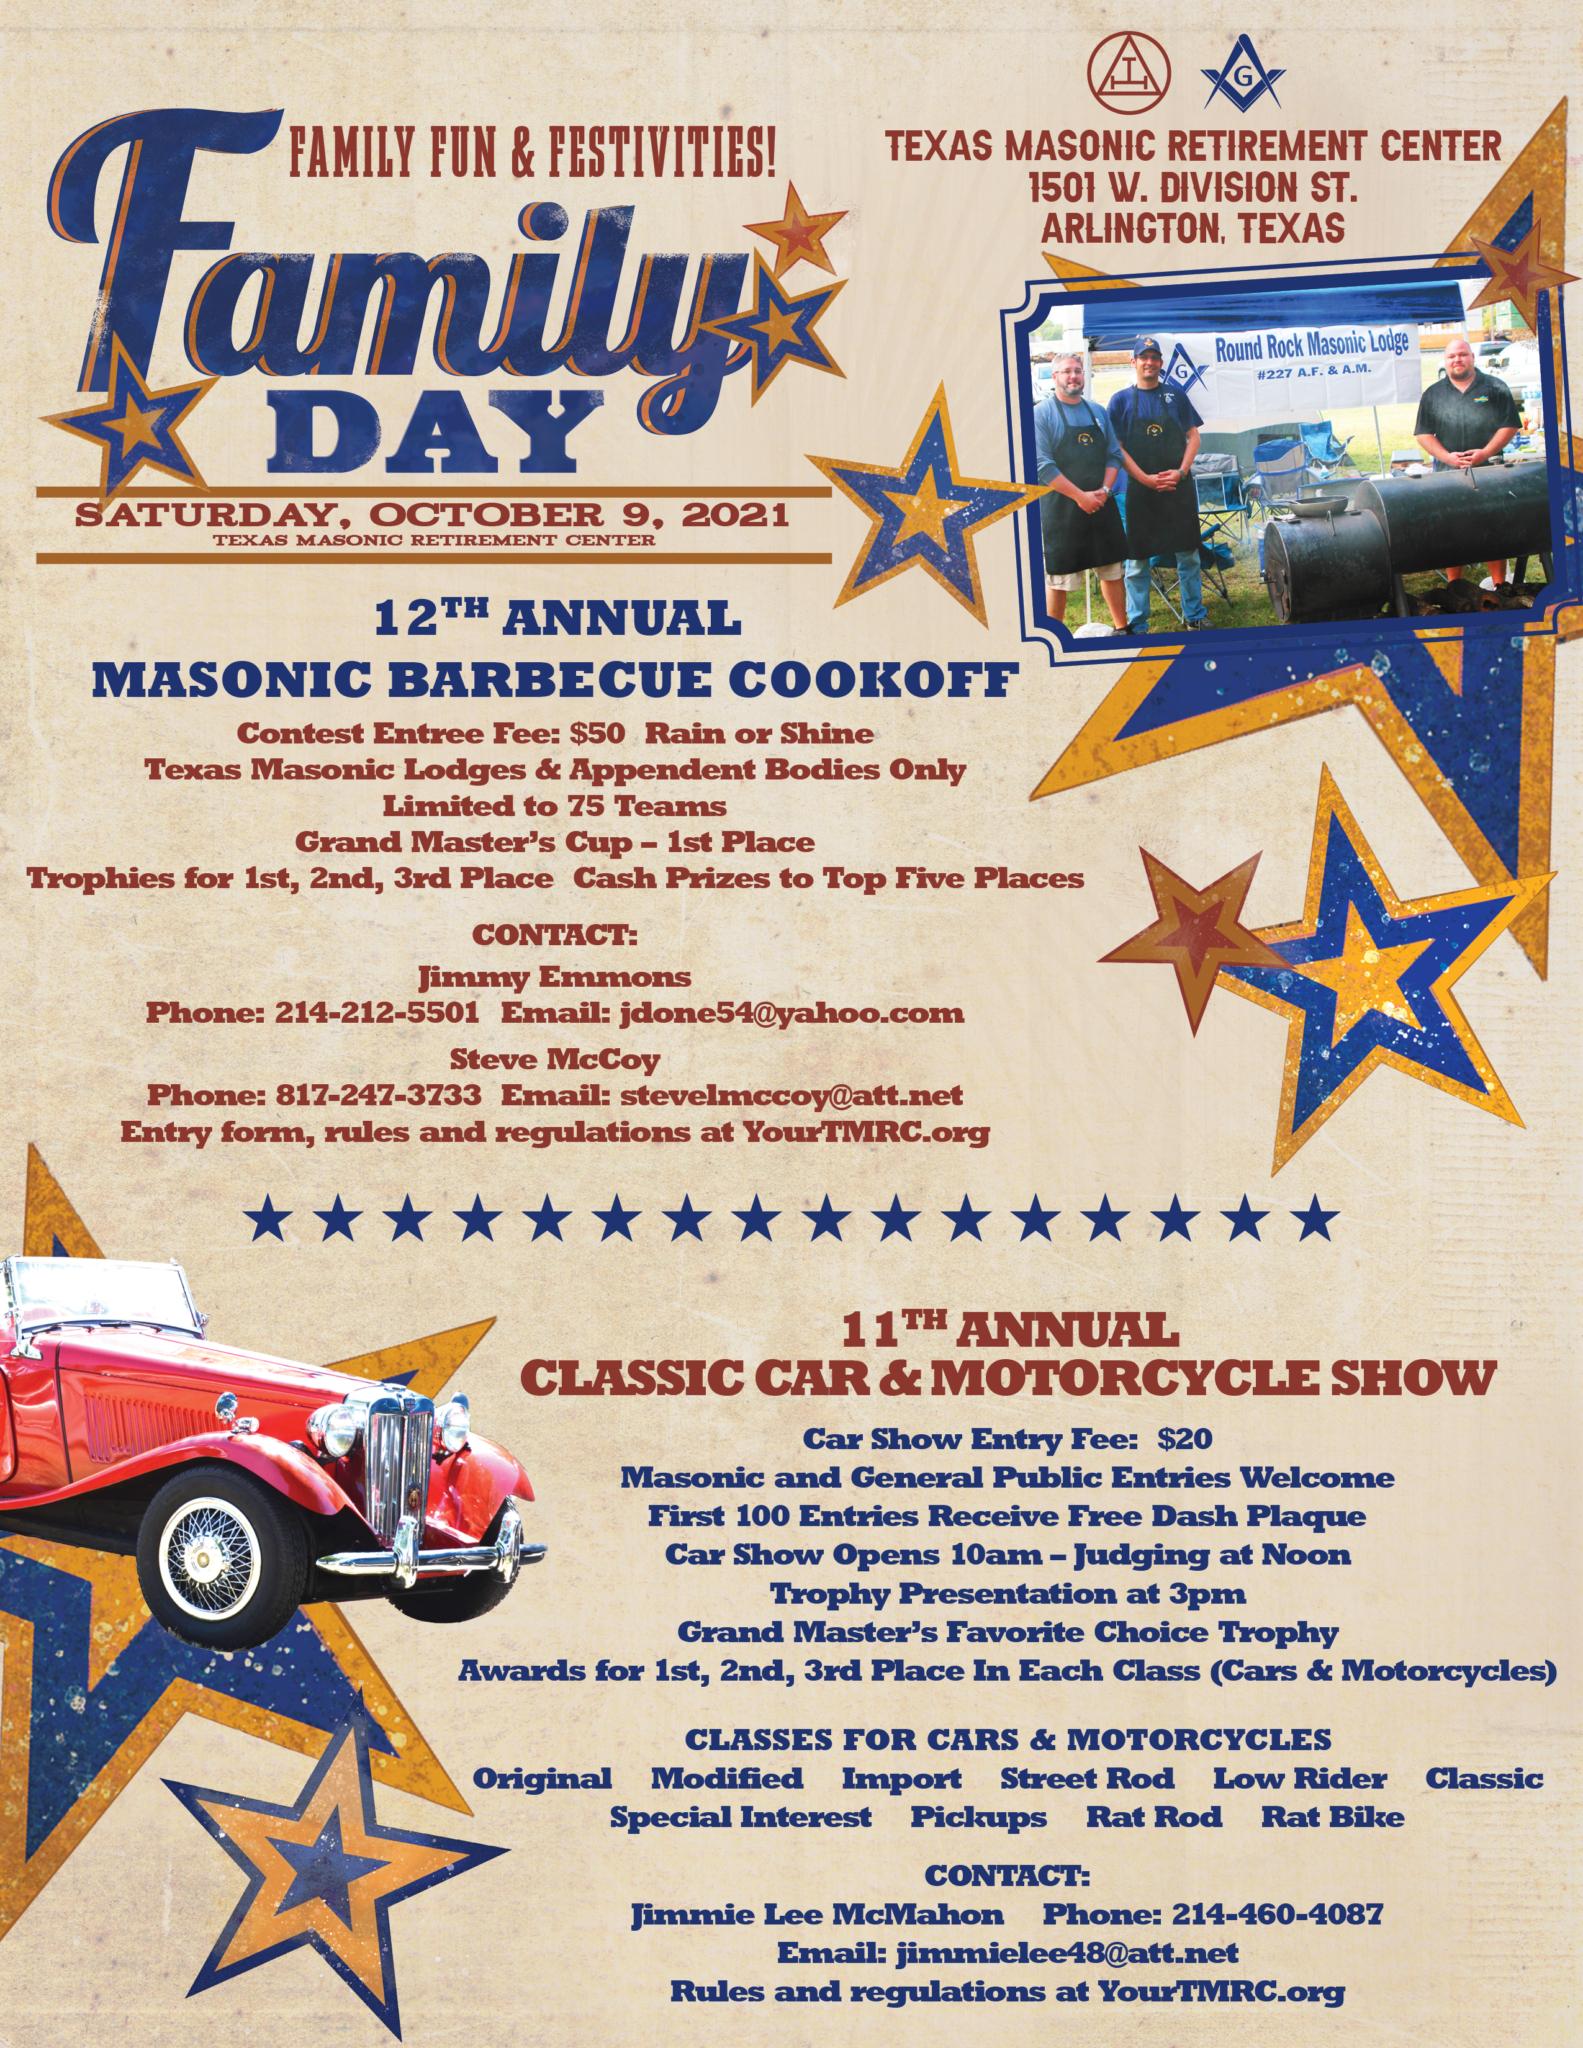 Family Day 2021 BBQ & Car Show Flier